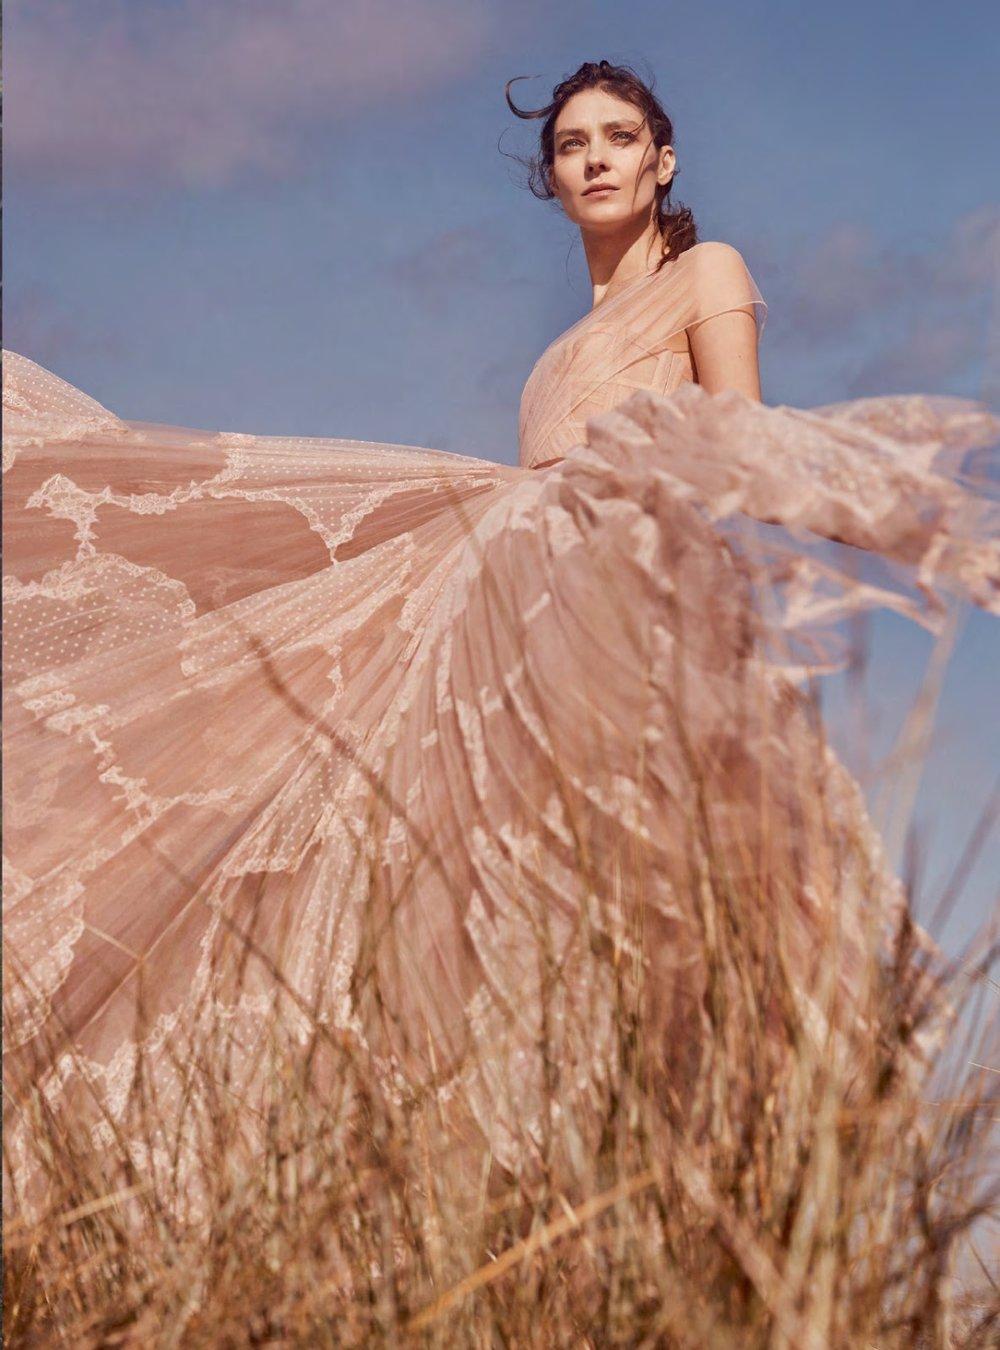 Kati Nescher by Richard Phibbs for Harper's Bazaar UK January 2019 (7).jpg